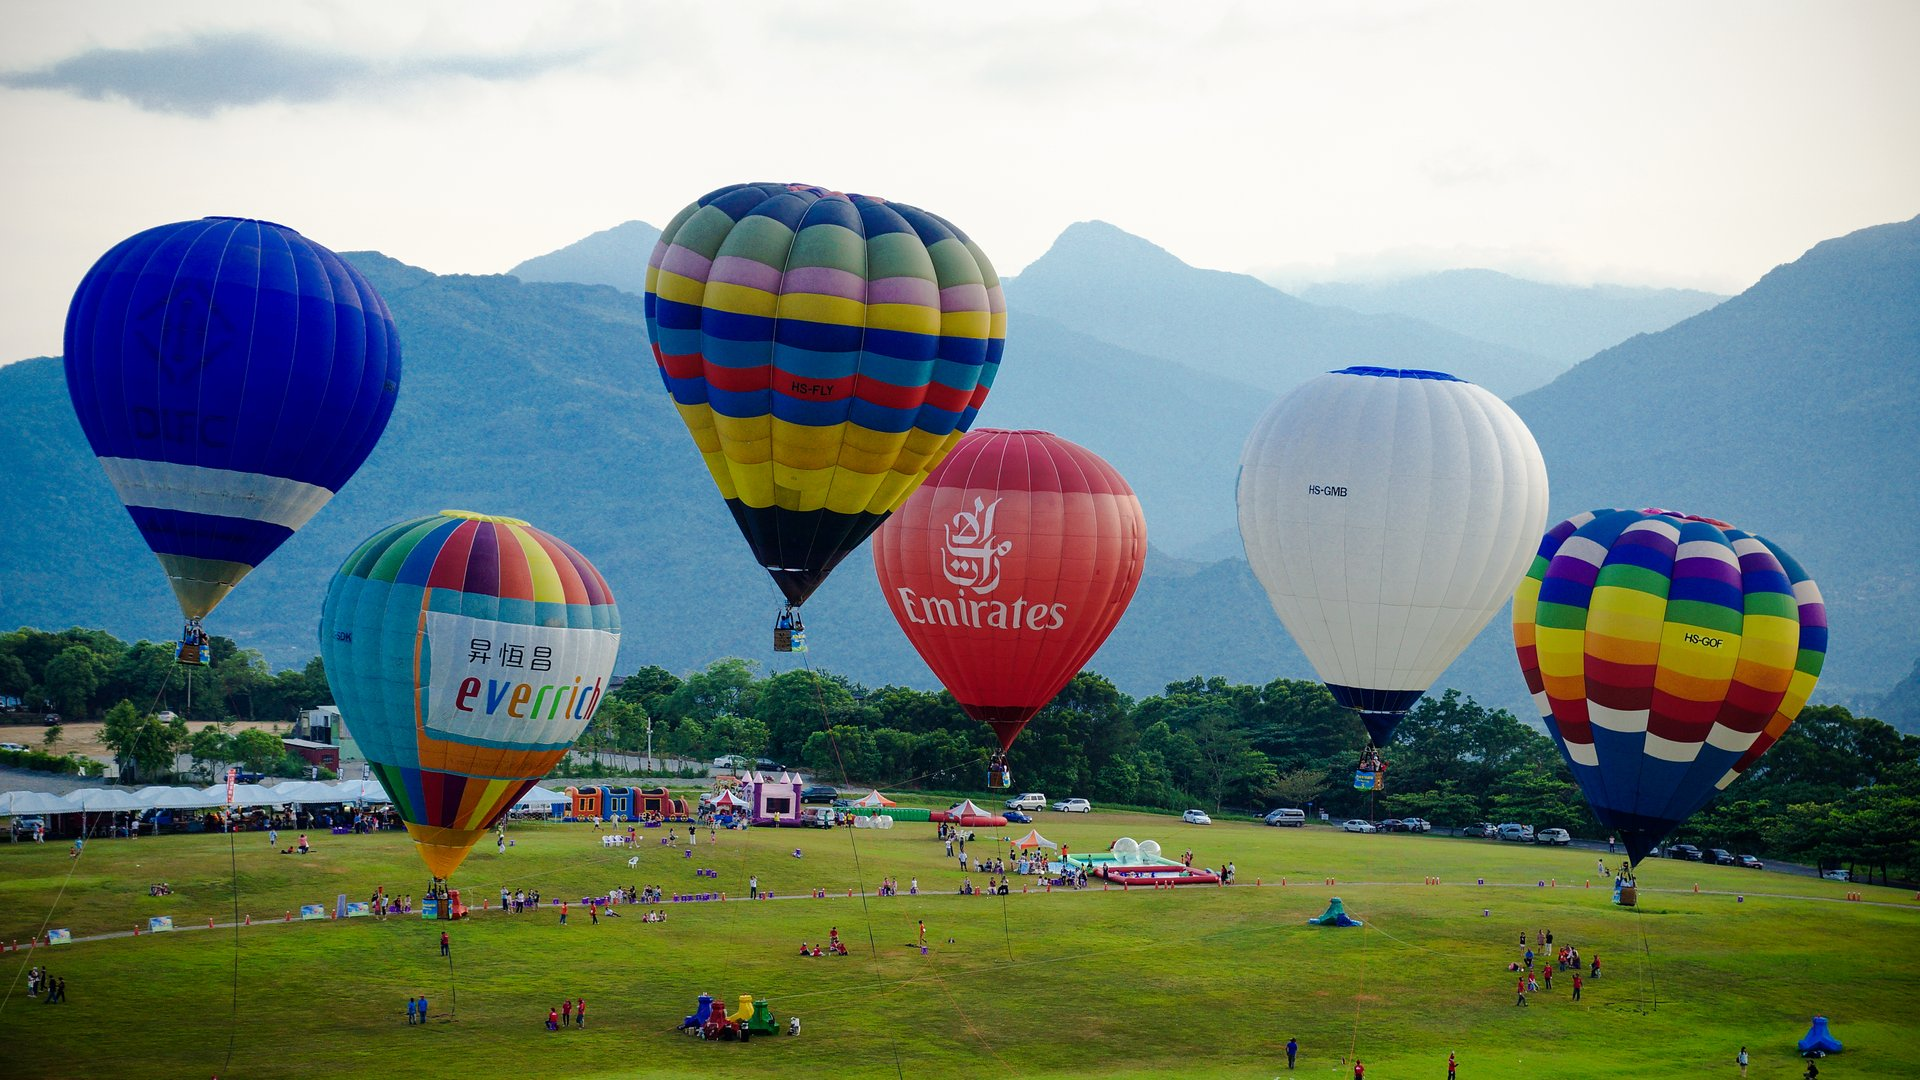 Taiwan Balloon Festival in Taiwan 2019 - Best Time